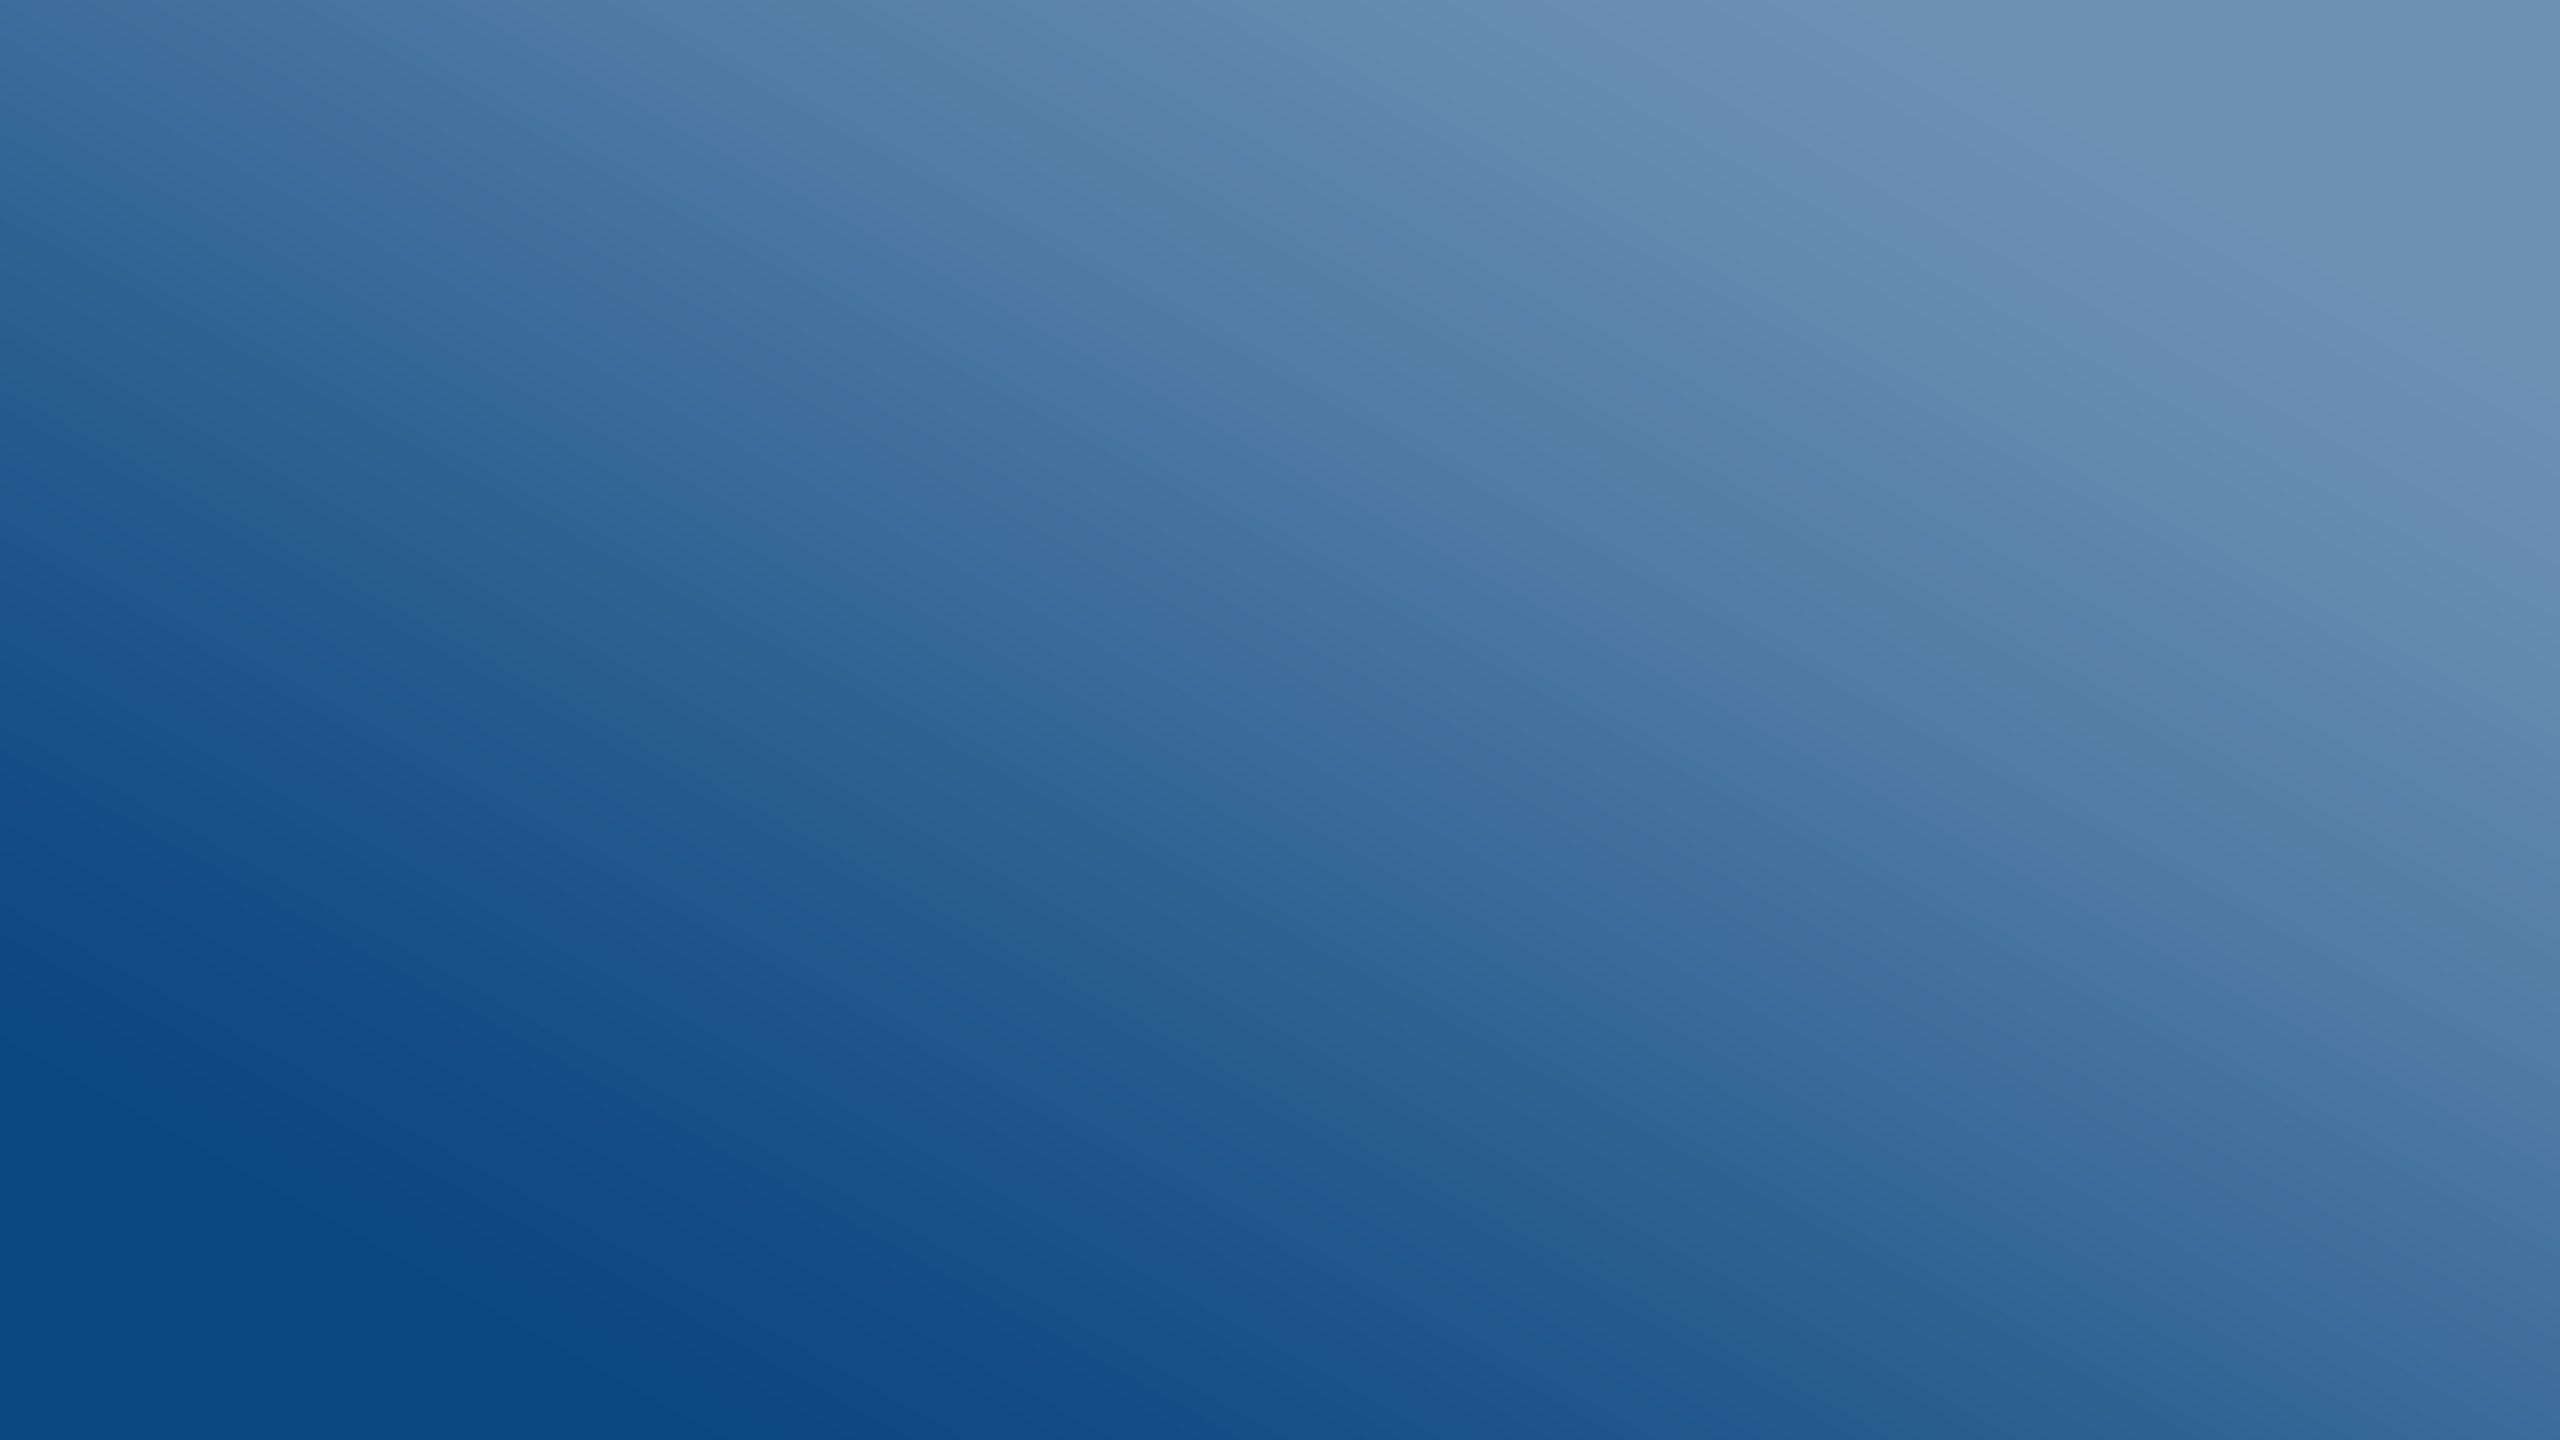 Download Wallpaper Mac Blue - 421544  Snapshot_239971.jpg